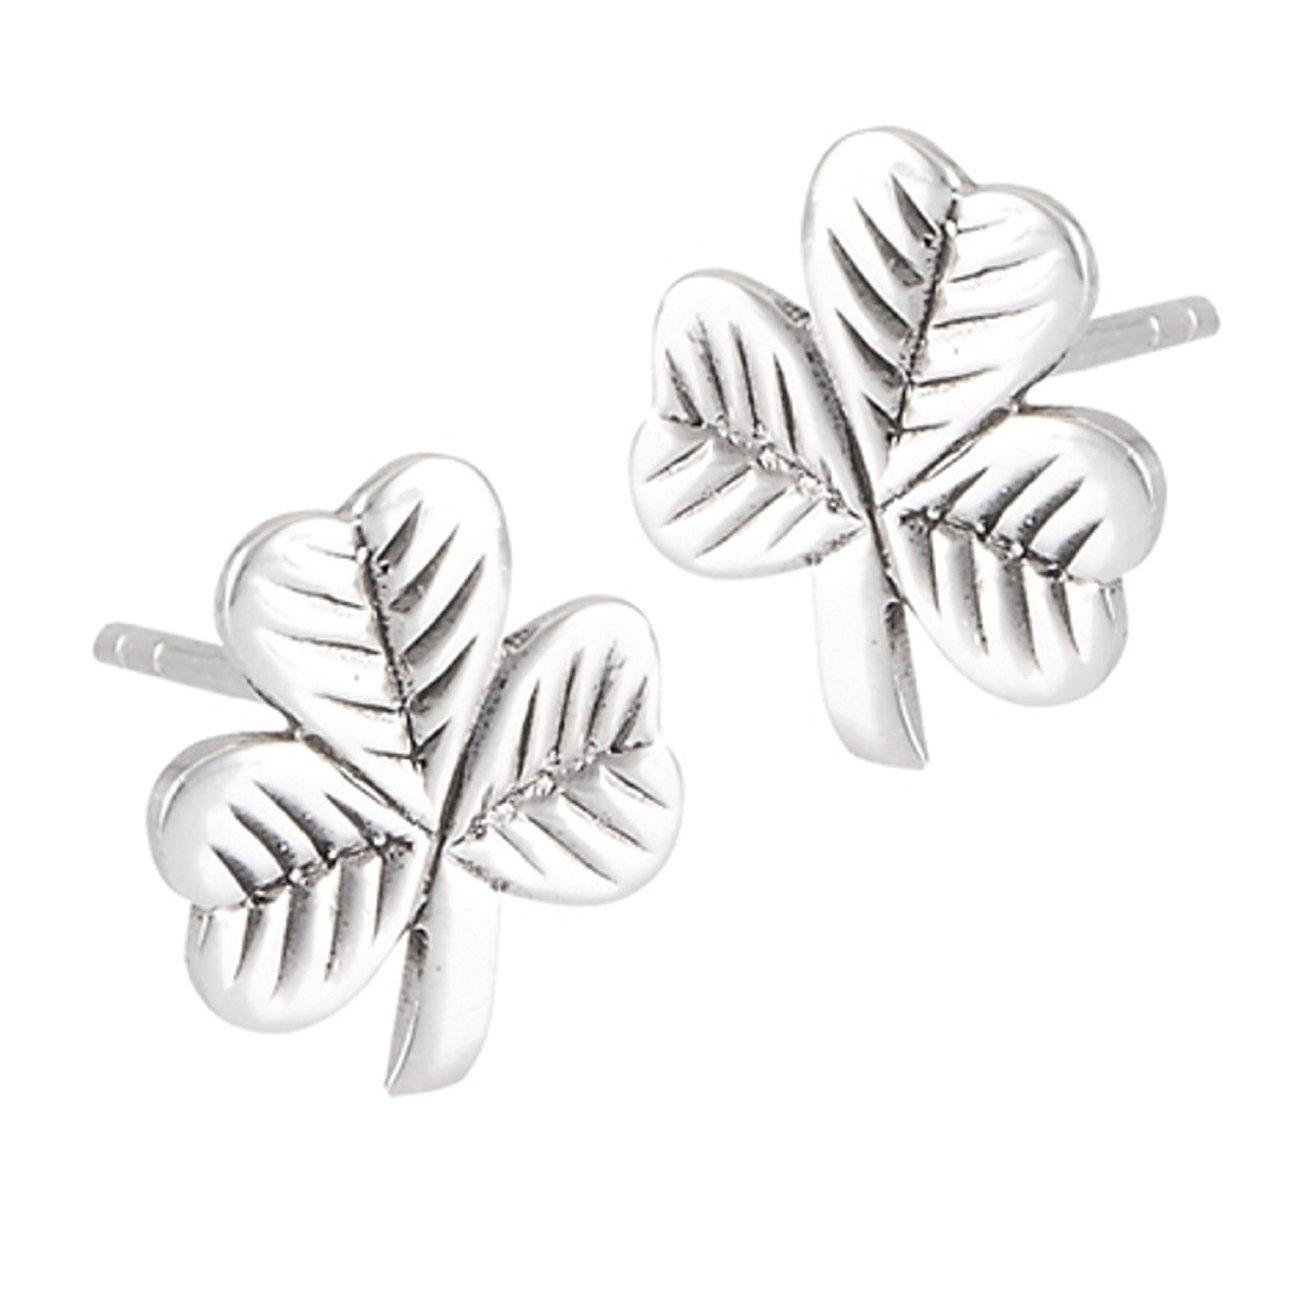 Sterling Silver Shamrock Three 3 Leaf Clover Post Stud Earrings